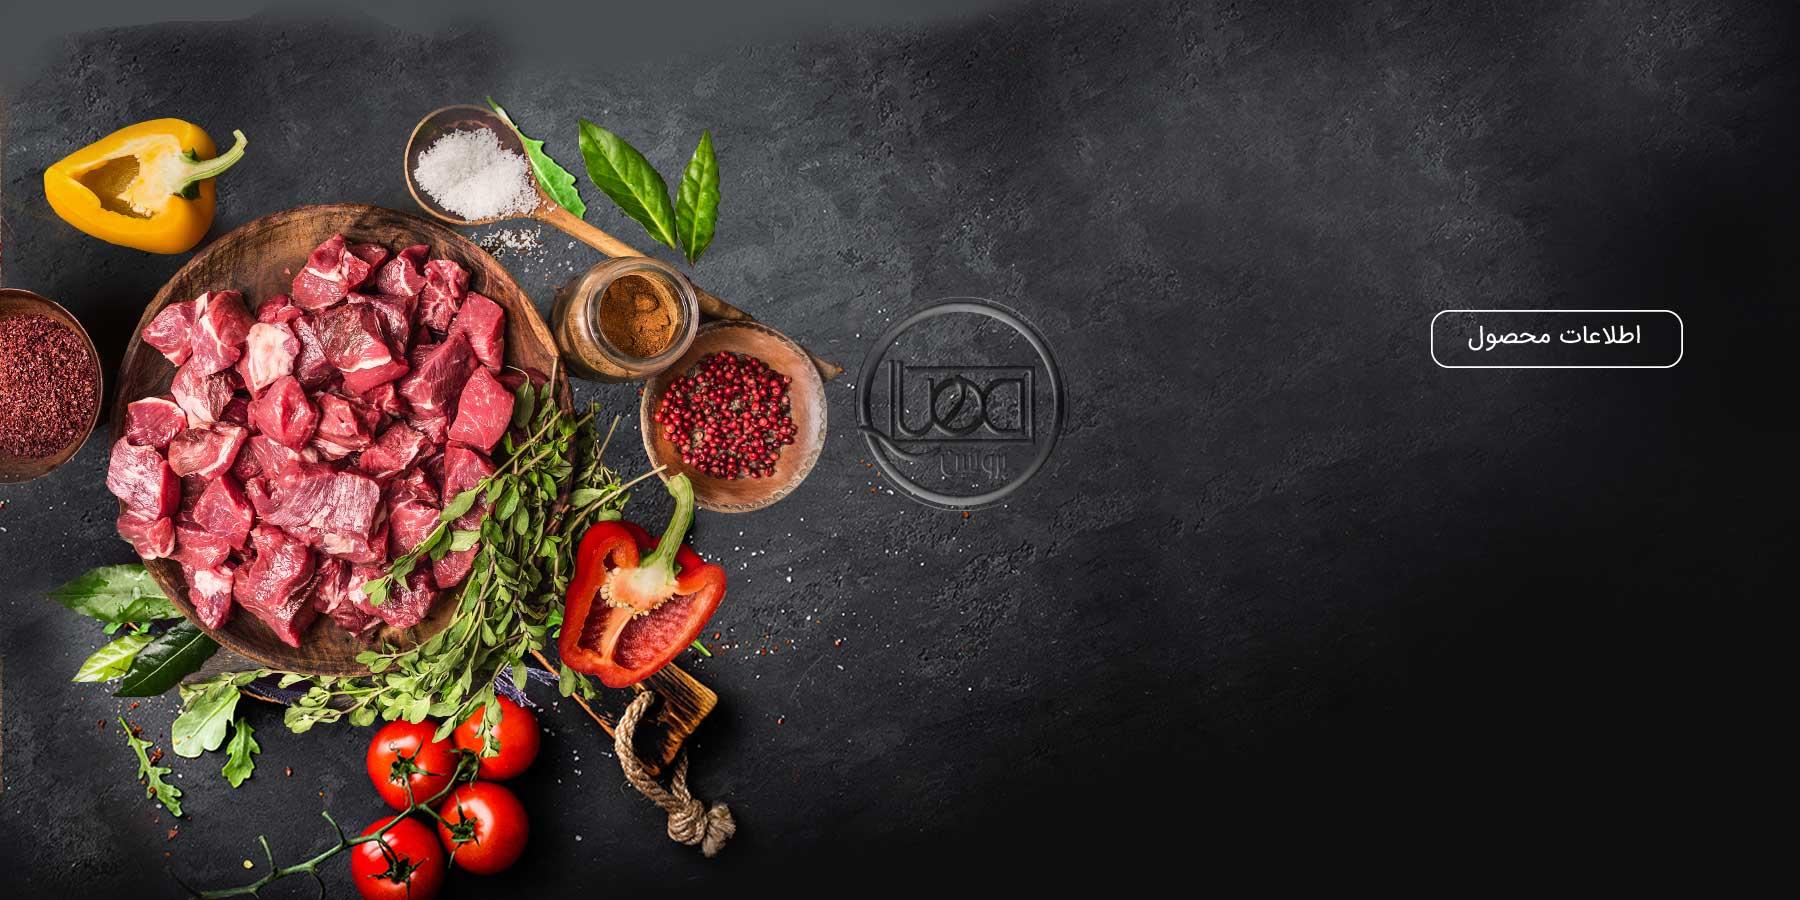 گوشت گوسفند مهیا پروتئین